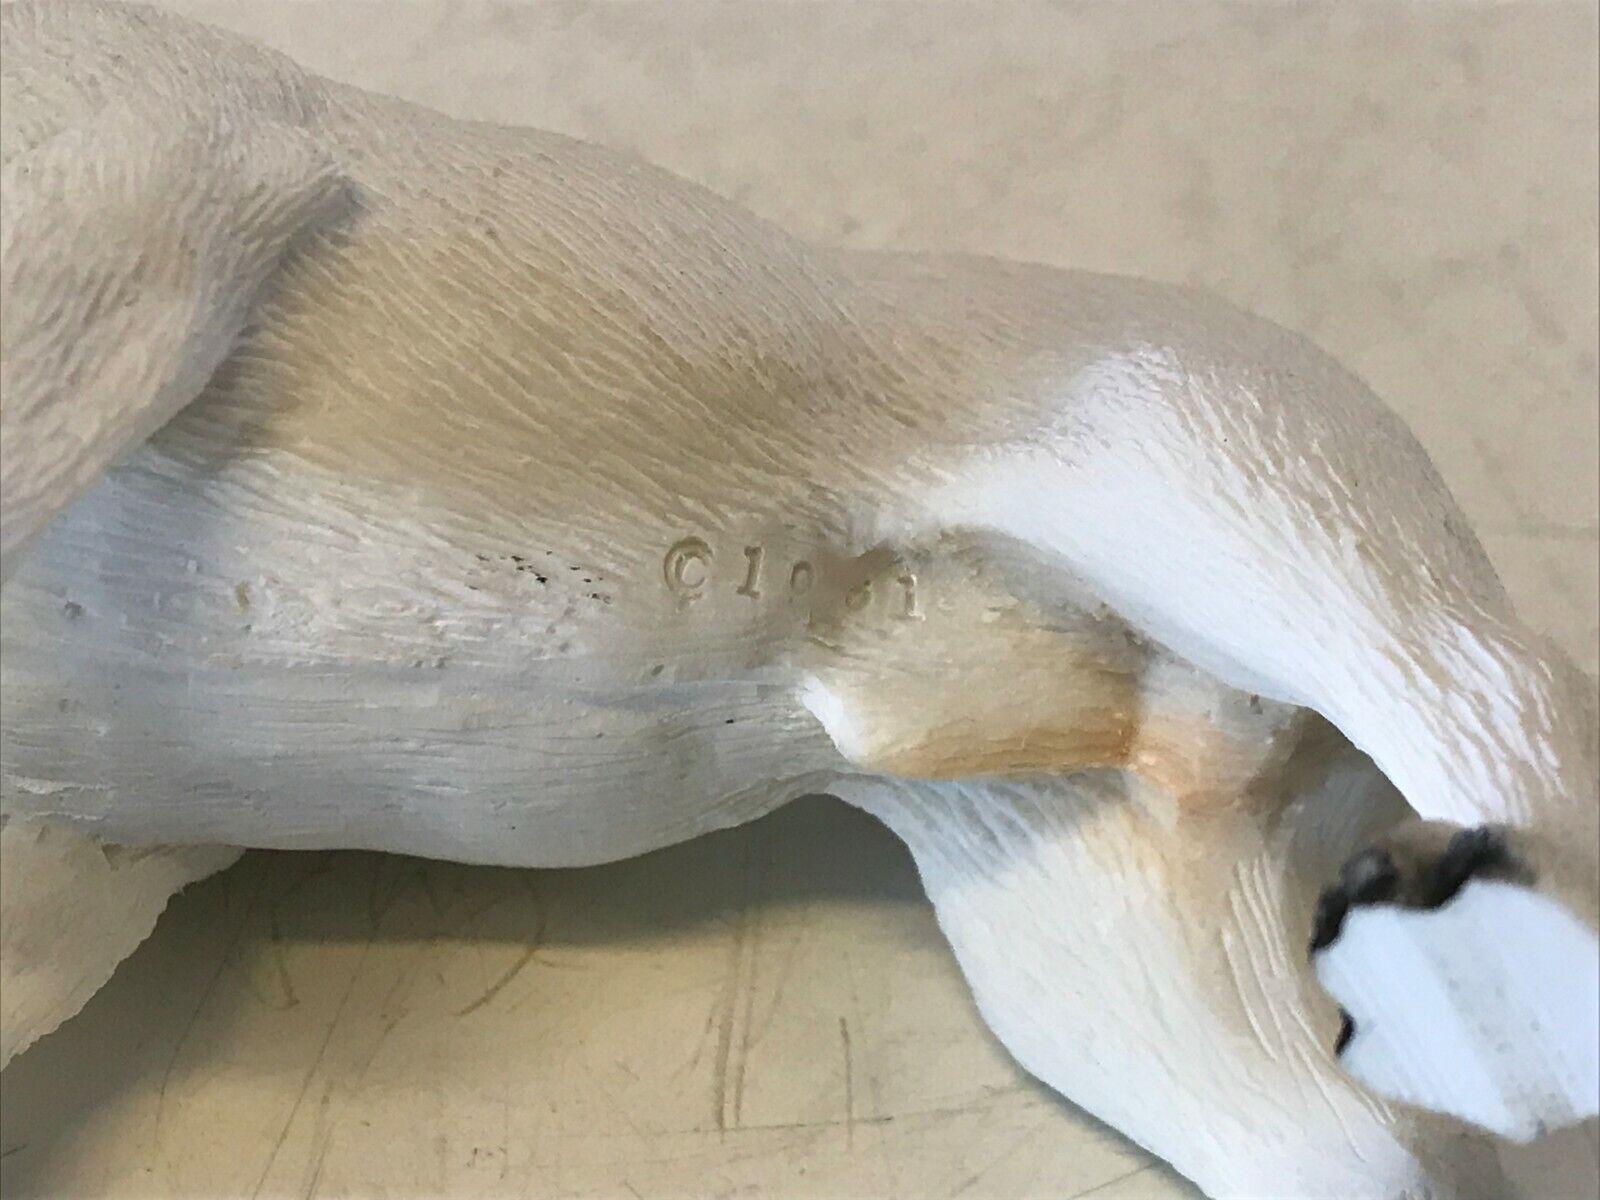 Bulldog anglais figurine debout blanc & résine marron